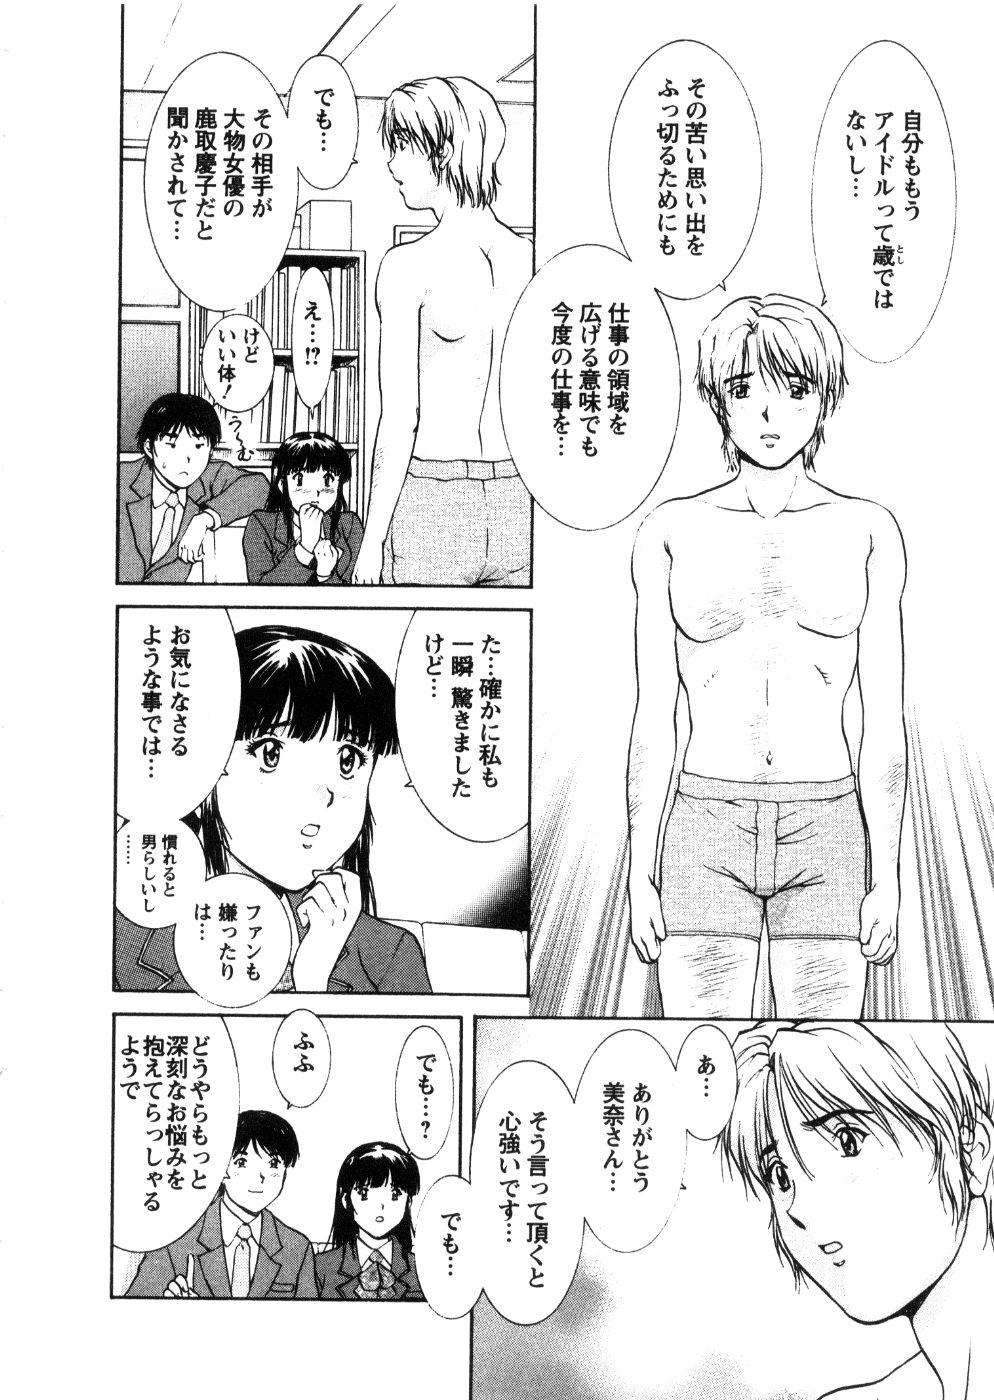 Oneechan-tachi ga Yatte Kuru 03 159